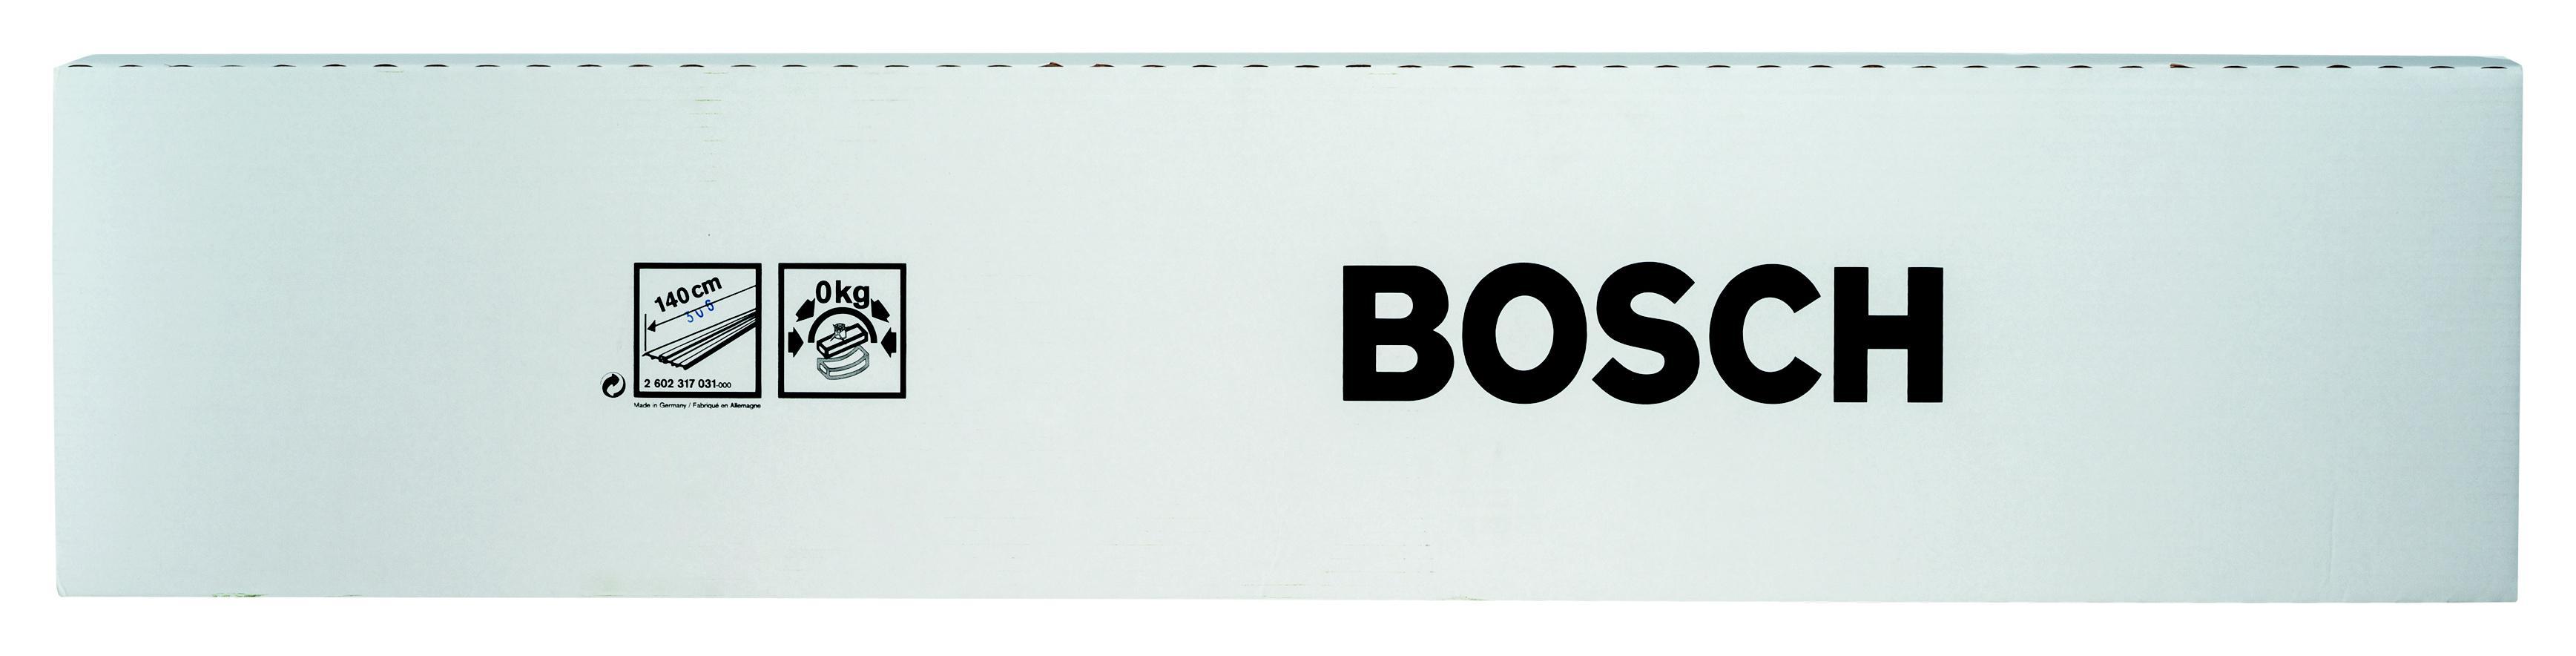 Шина направляющая Bosch Fsn 140 (2.602.317.031)